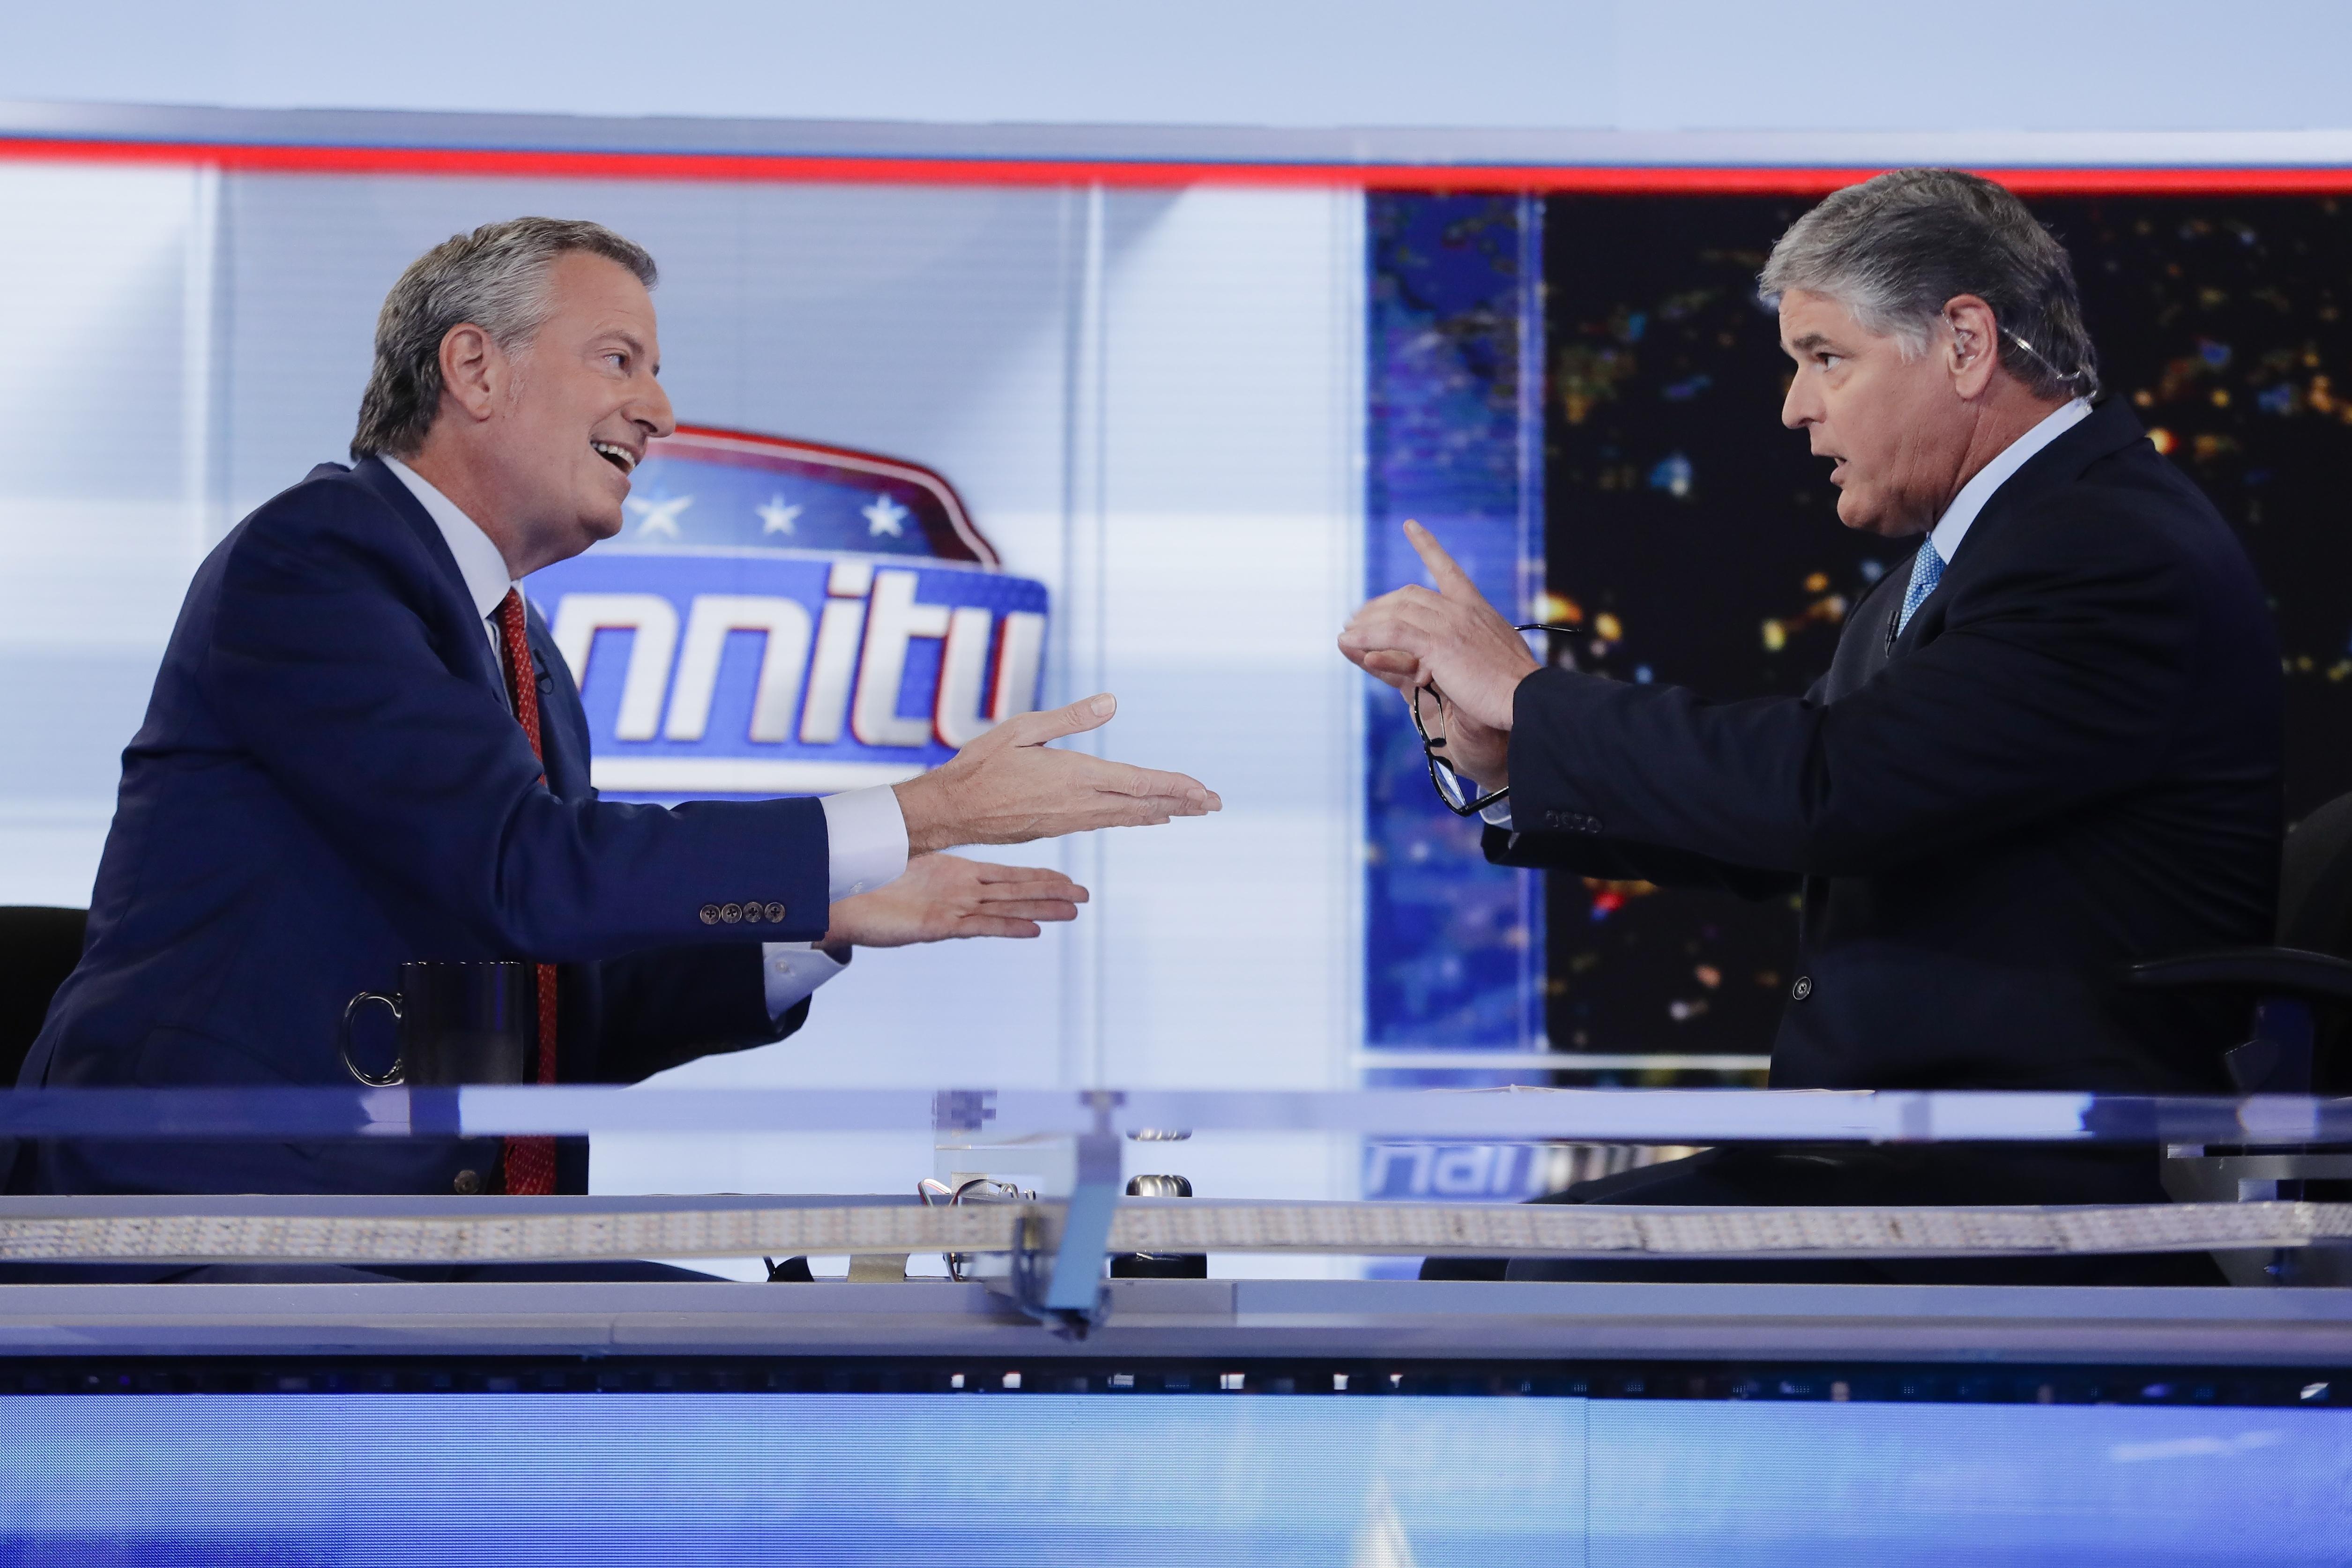 Hannity to de Blasio: You drive me crazy!